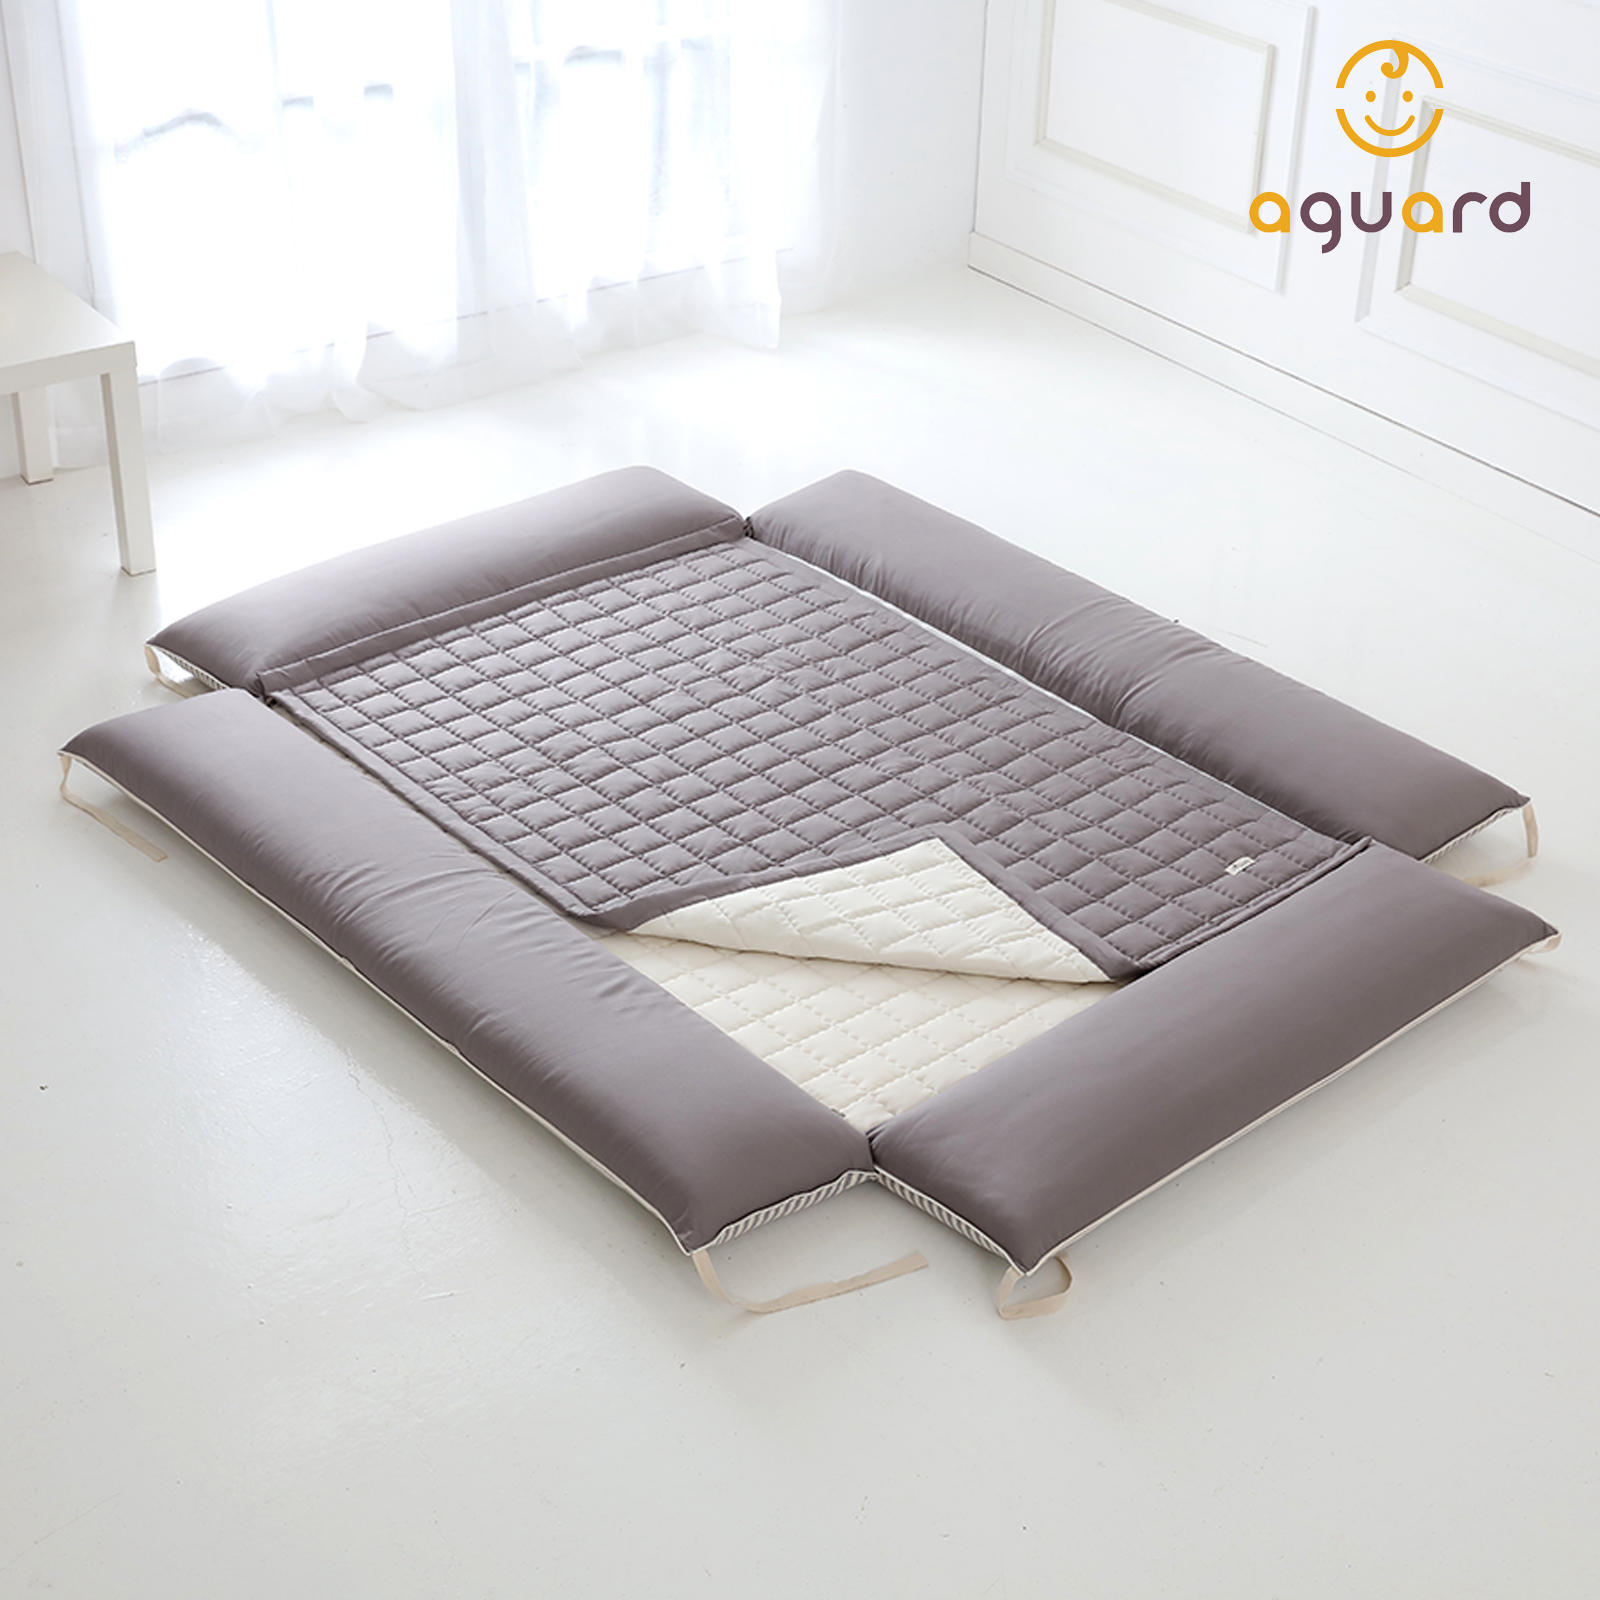 Aguard Bumper Bed Waterproof Mattress Protector L Mummy